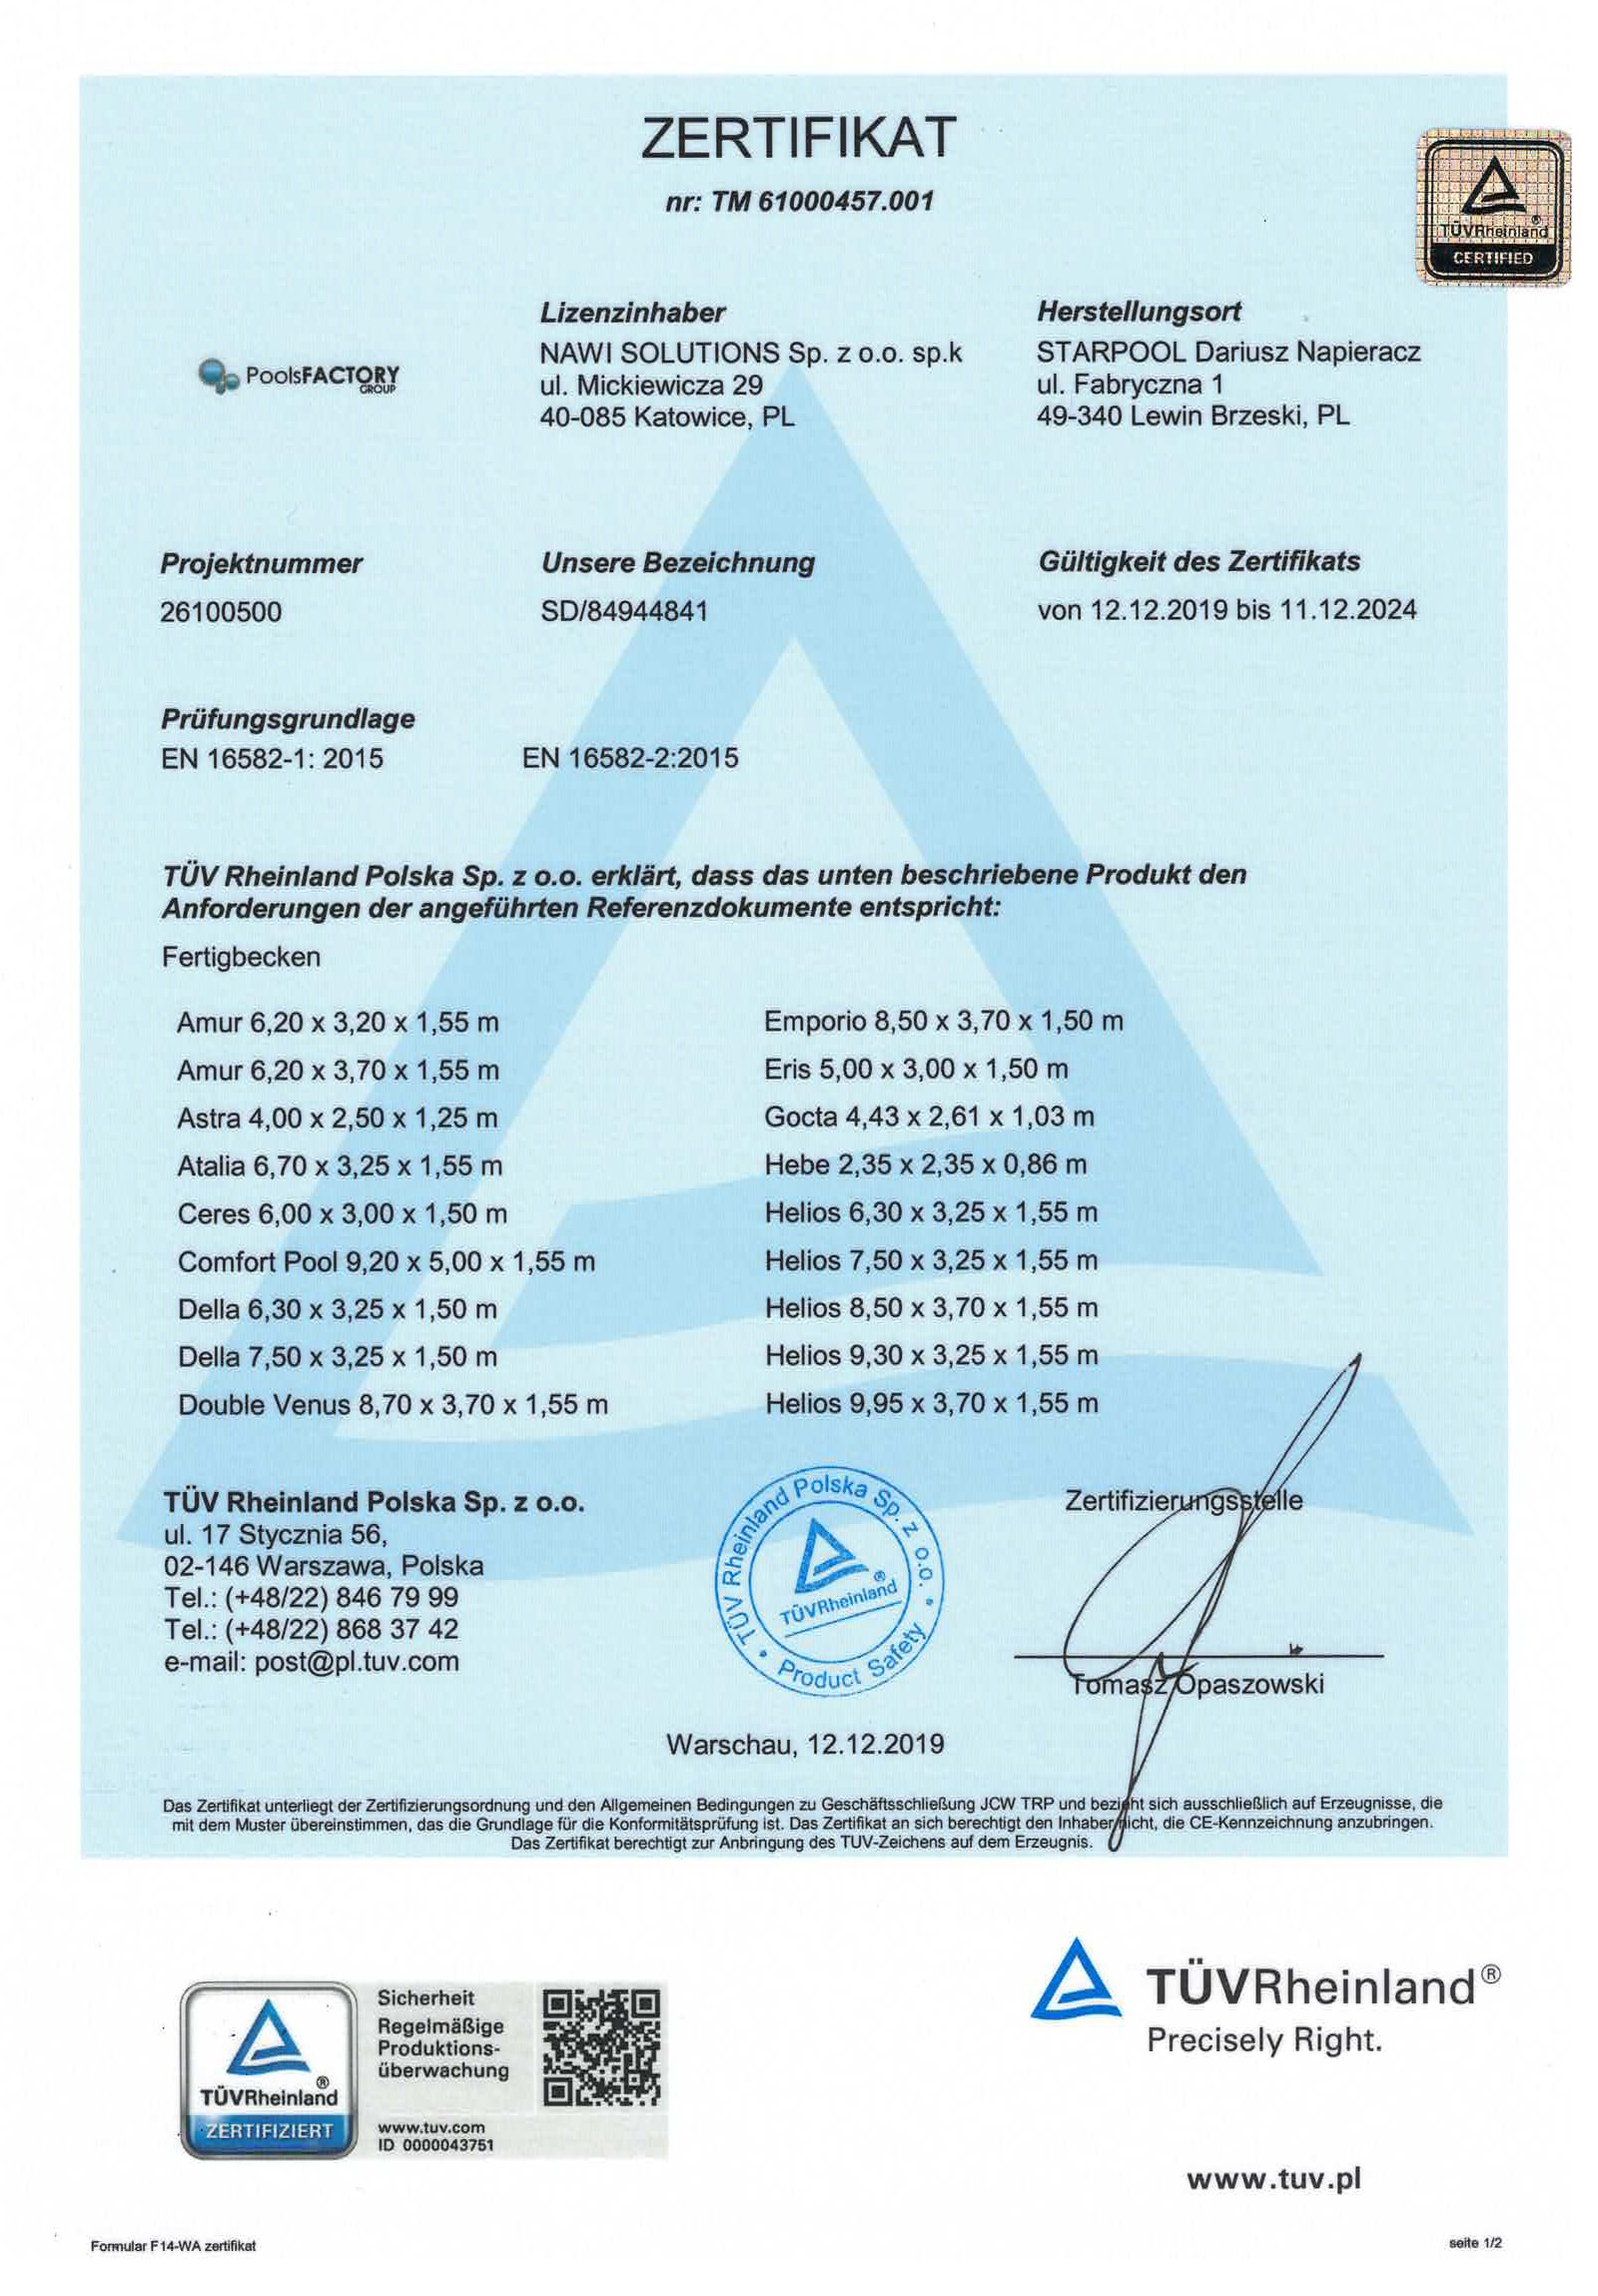 Zertifikat TÜV Rheinland